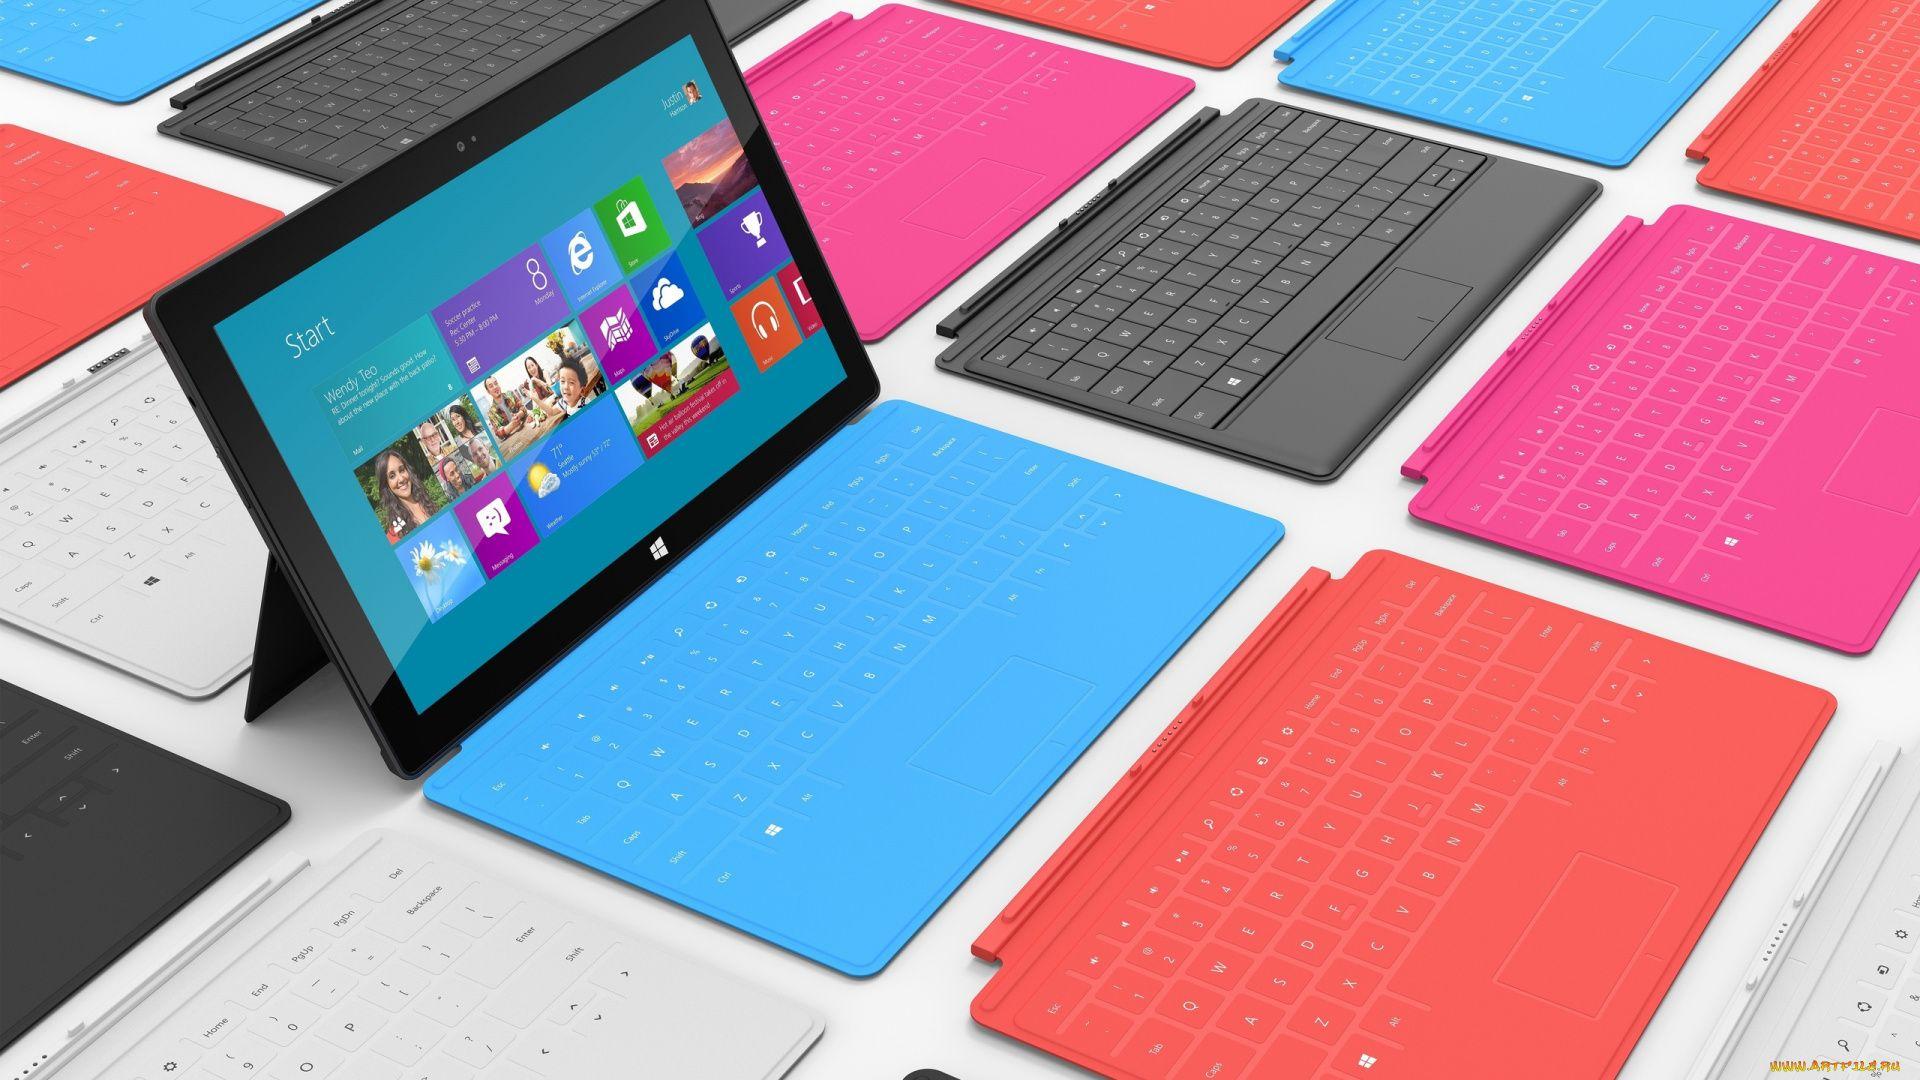 Surface Pro background